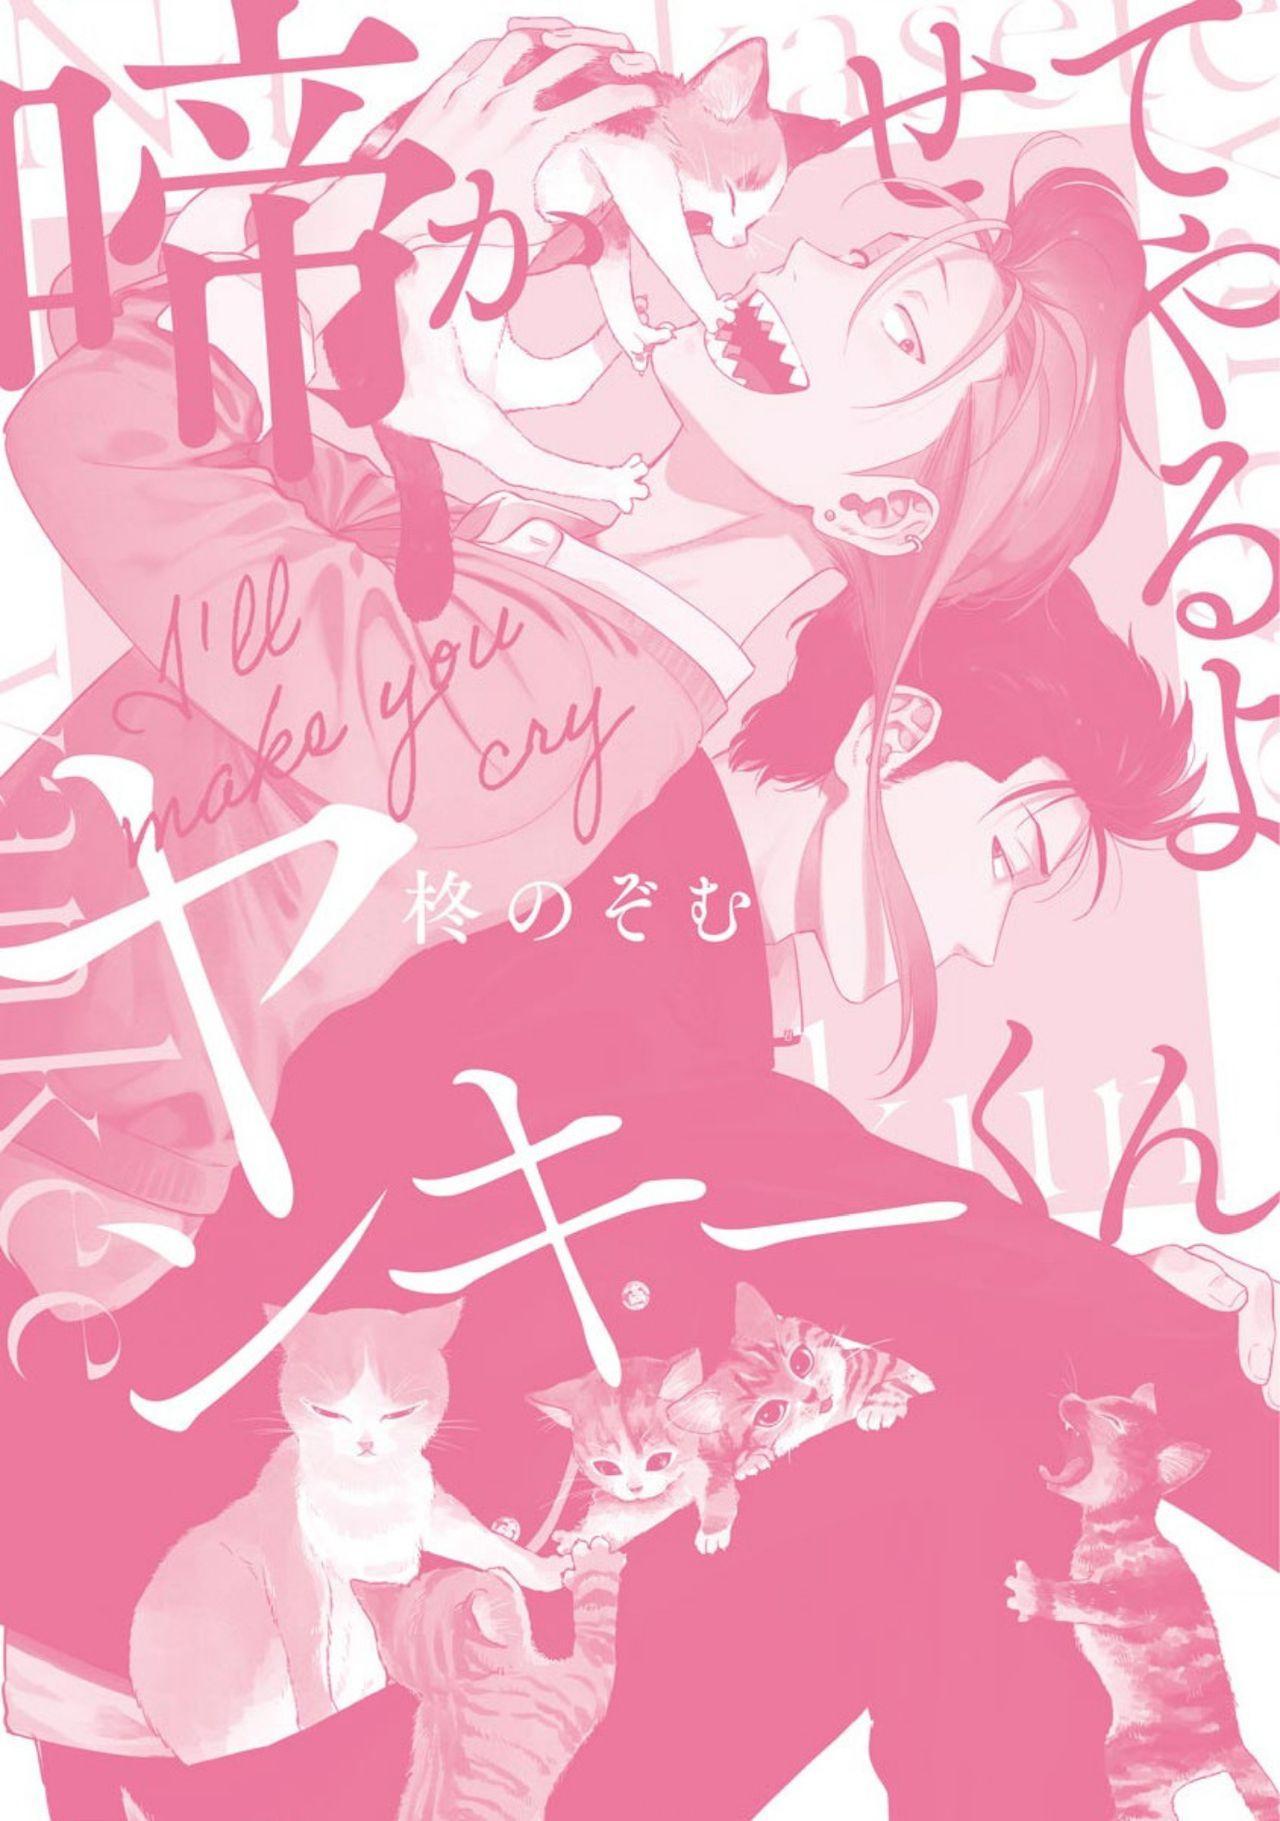 [Hiiragi Nozomu] Nakasete Yaru yo Yankee-kun   I'll Make You Cry Ch. 1-5 + Extras [English] [Digital] 203